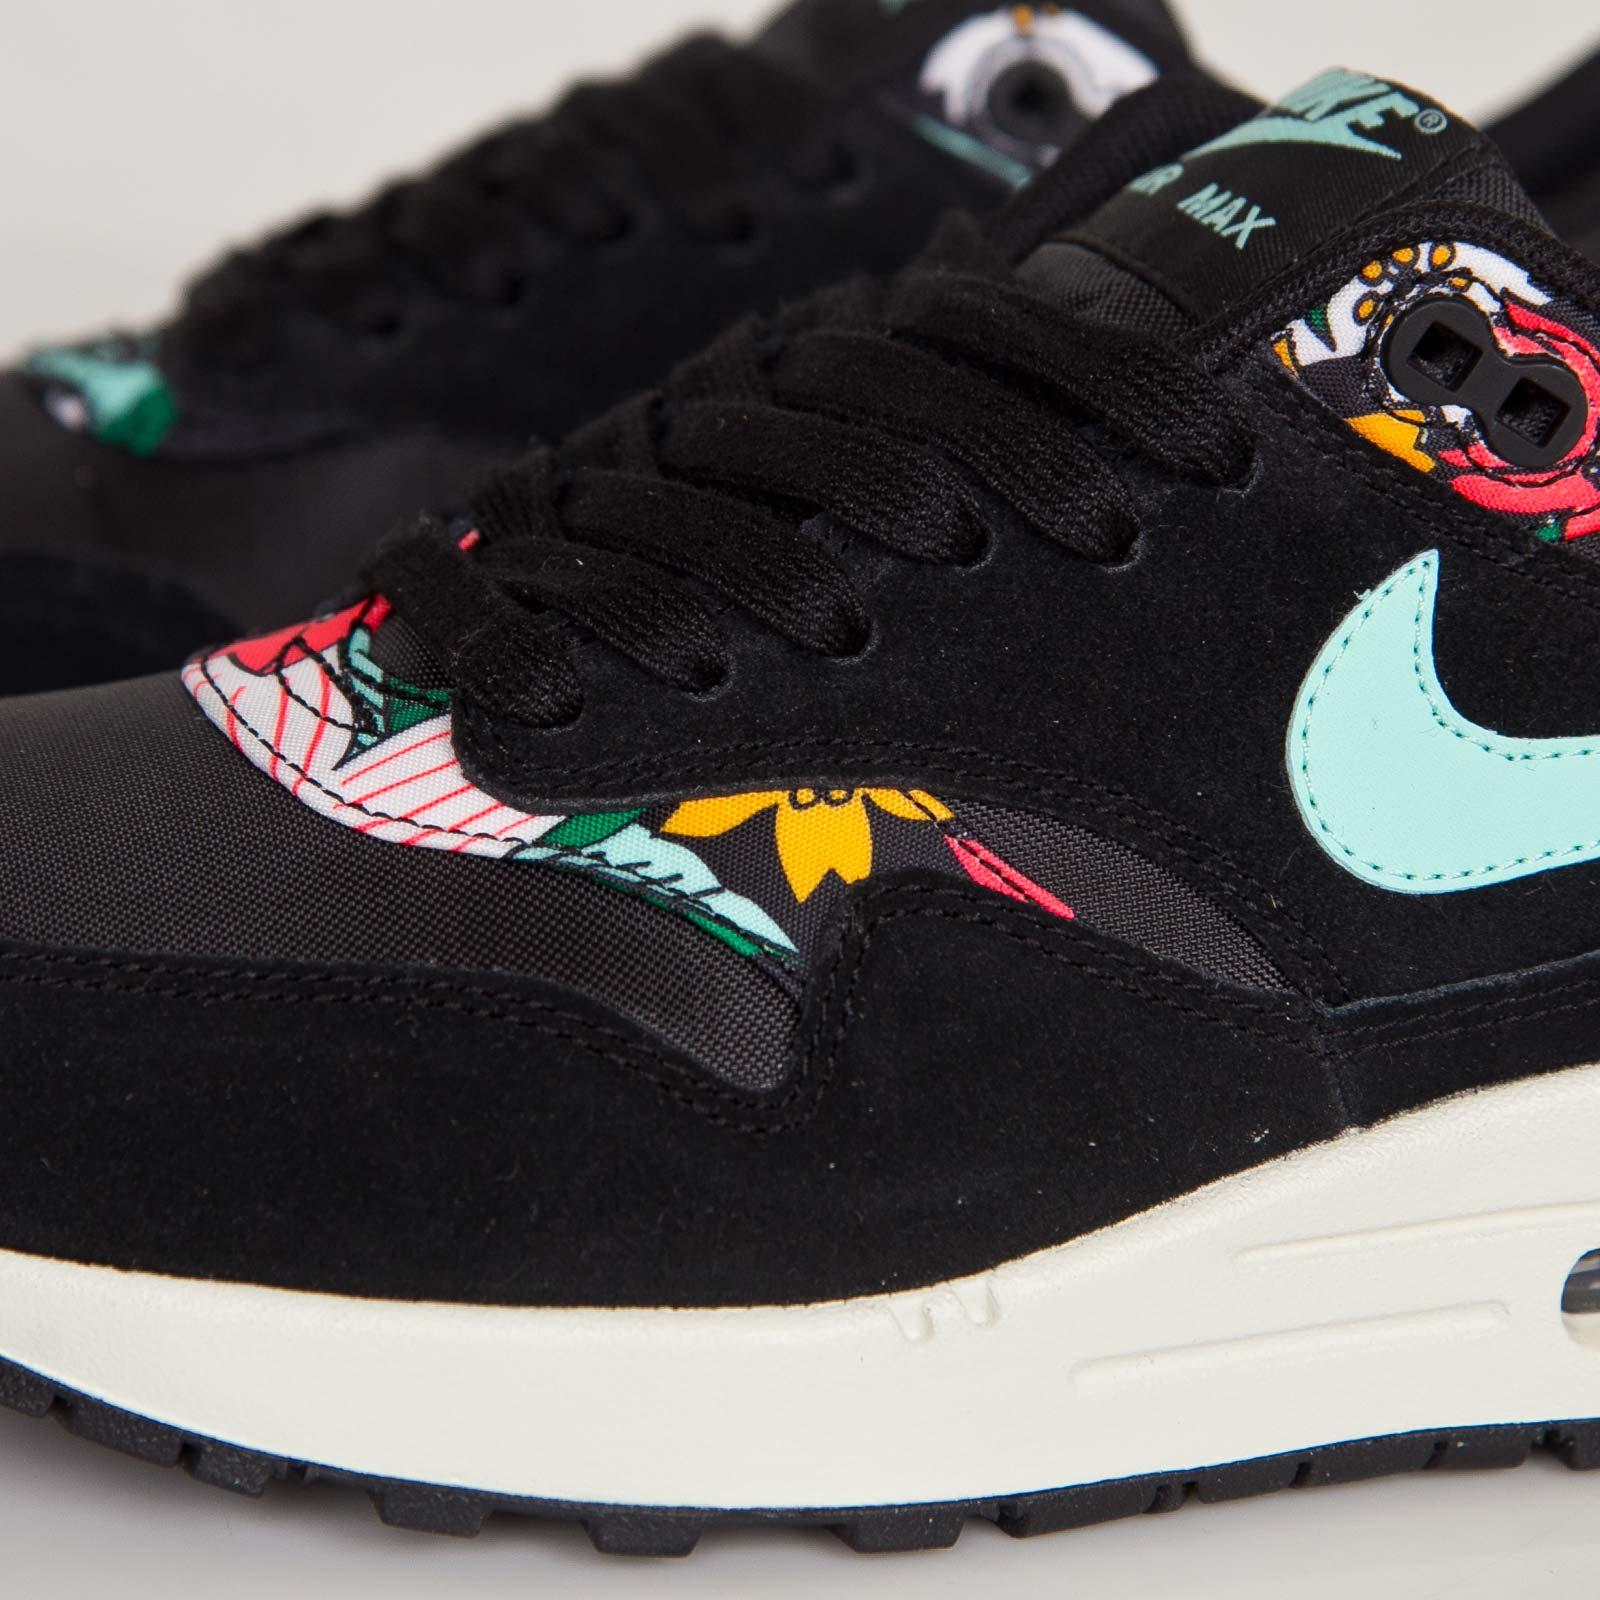 Nike Wmns Air Max 1 Print - 528898-003 - Sneakersnstuff ...